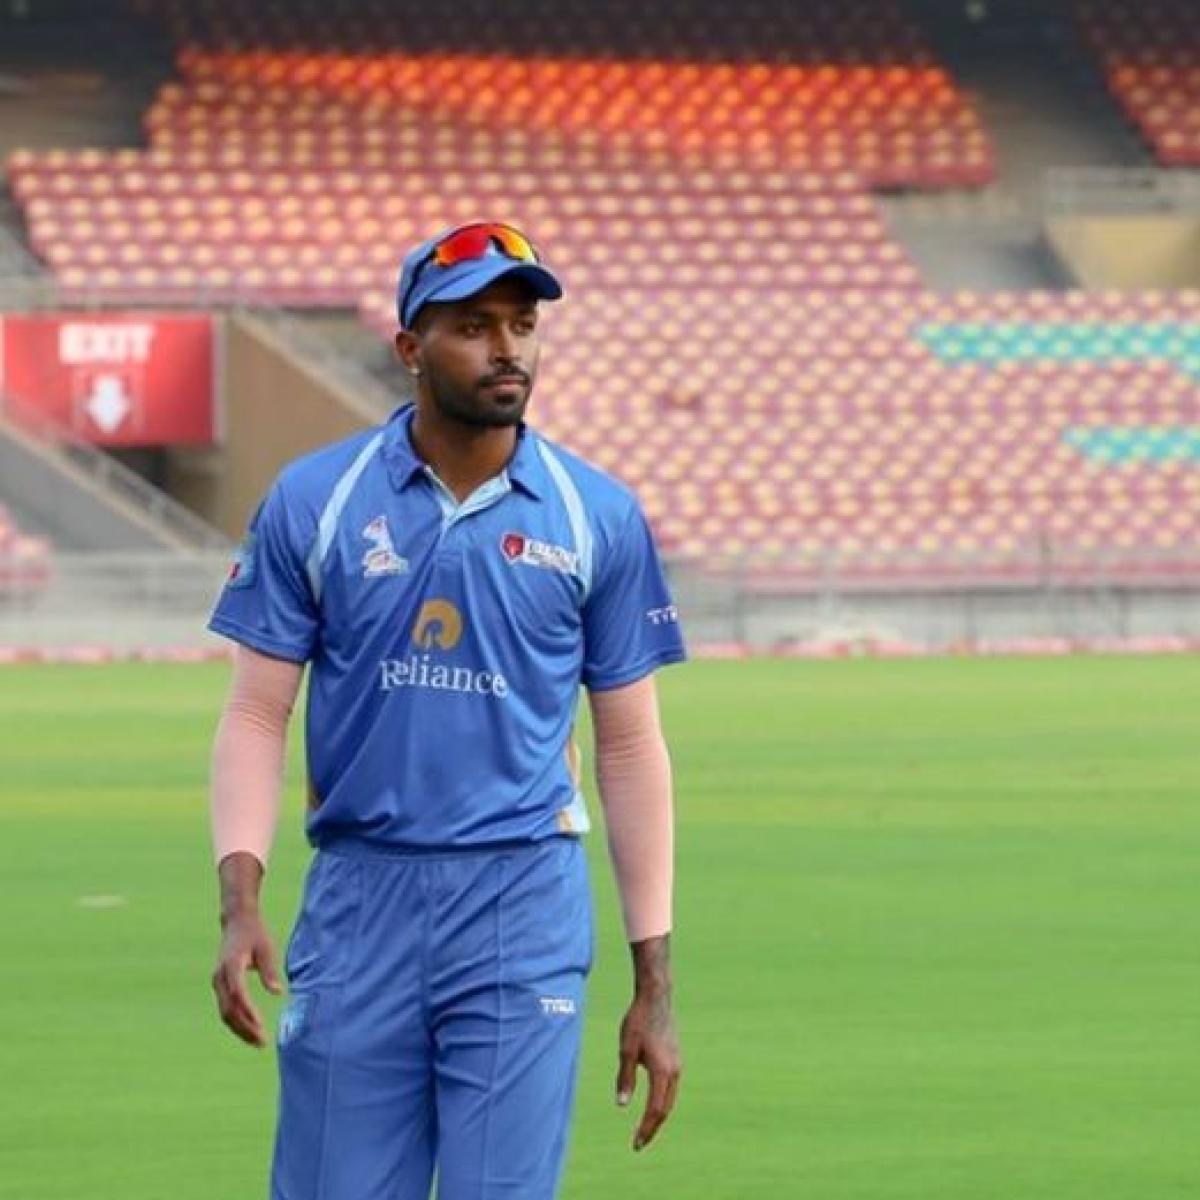 'Good to be back': Hardik Pandya marks his return after suffering lower back injury